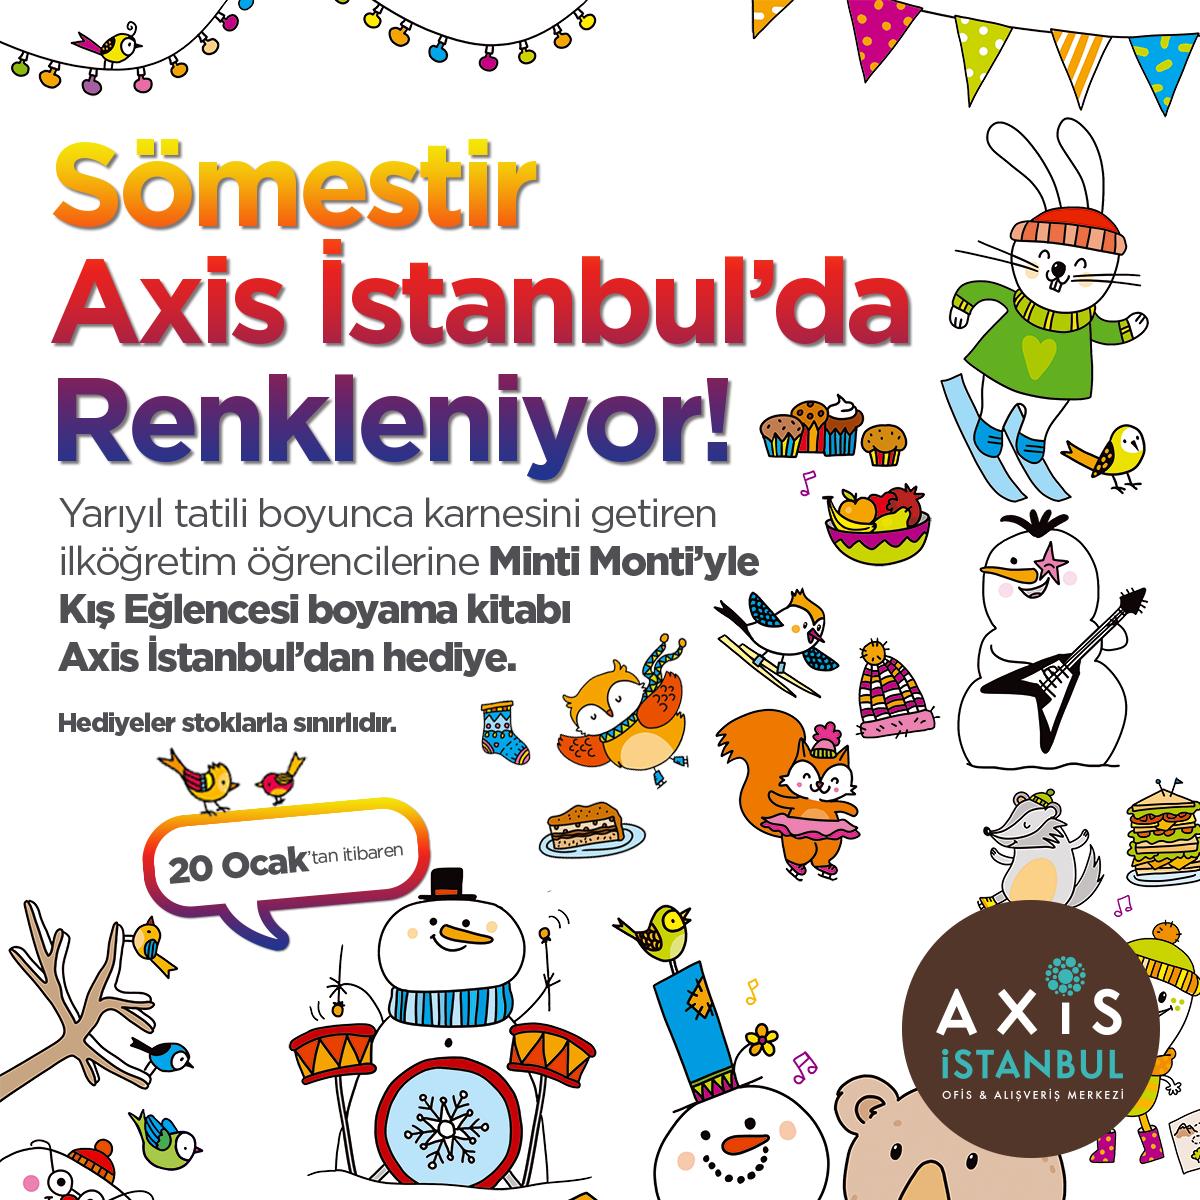 Axis Istanbul Kampanyalar Minti Monti Yle Kis Eglencesi Boyama Kitabi